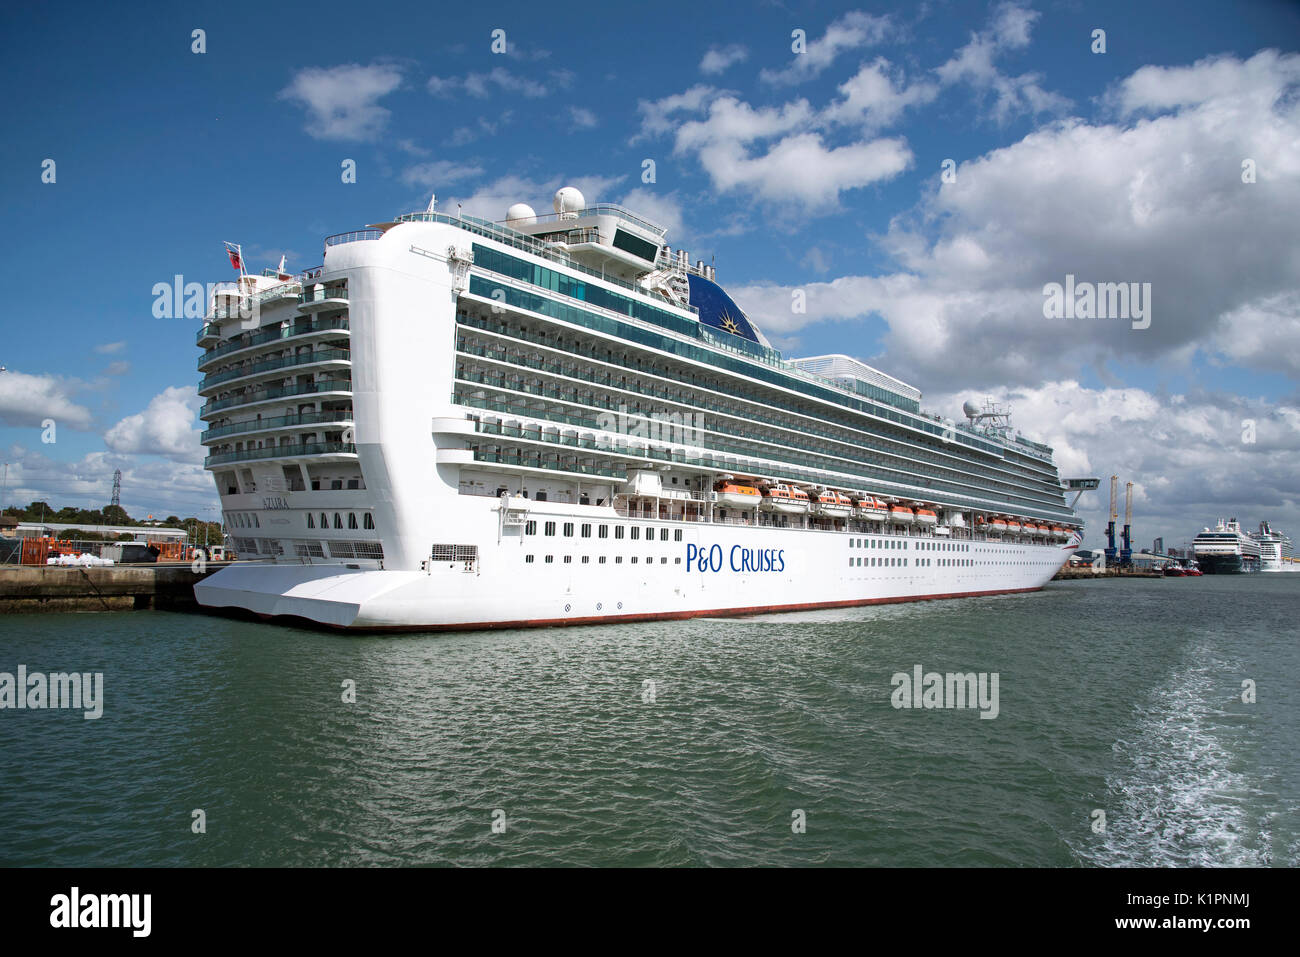 The cruise ship Azura alongside in the Port of Southampton England UK. August 2017 - Stock Image